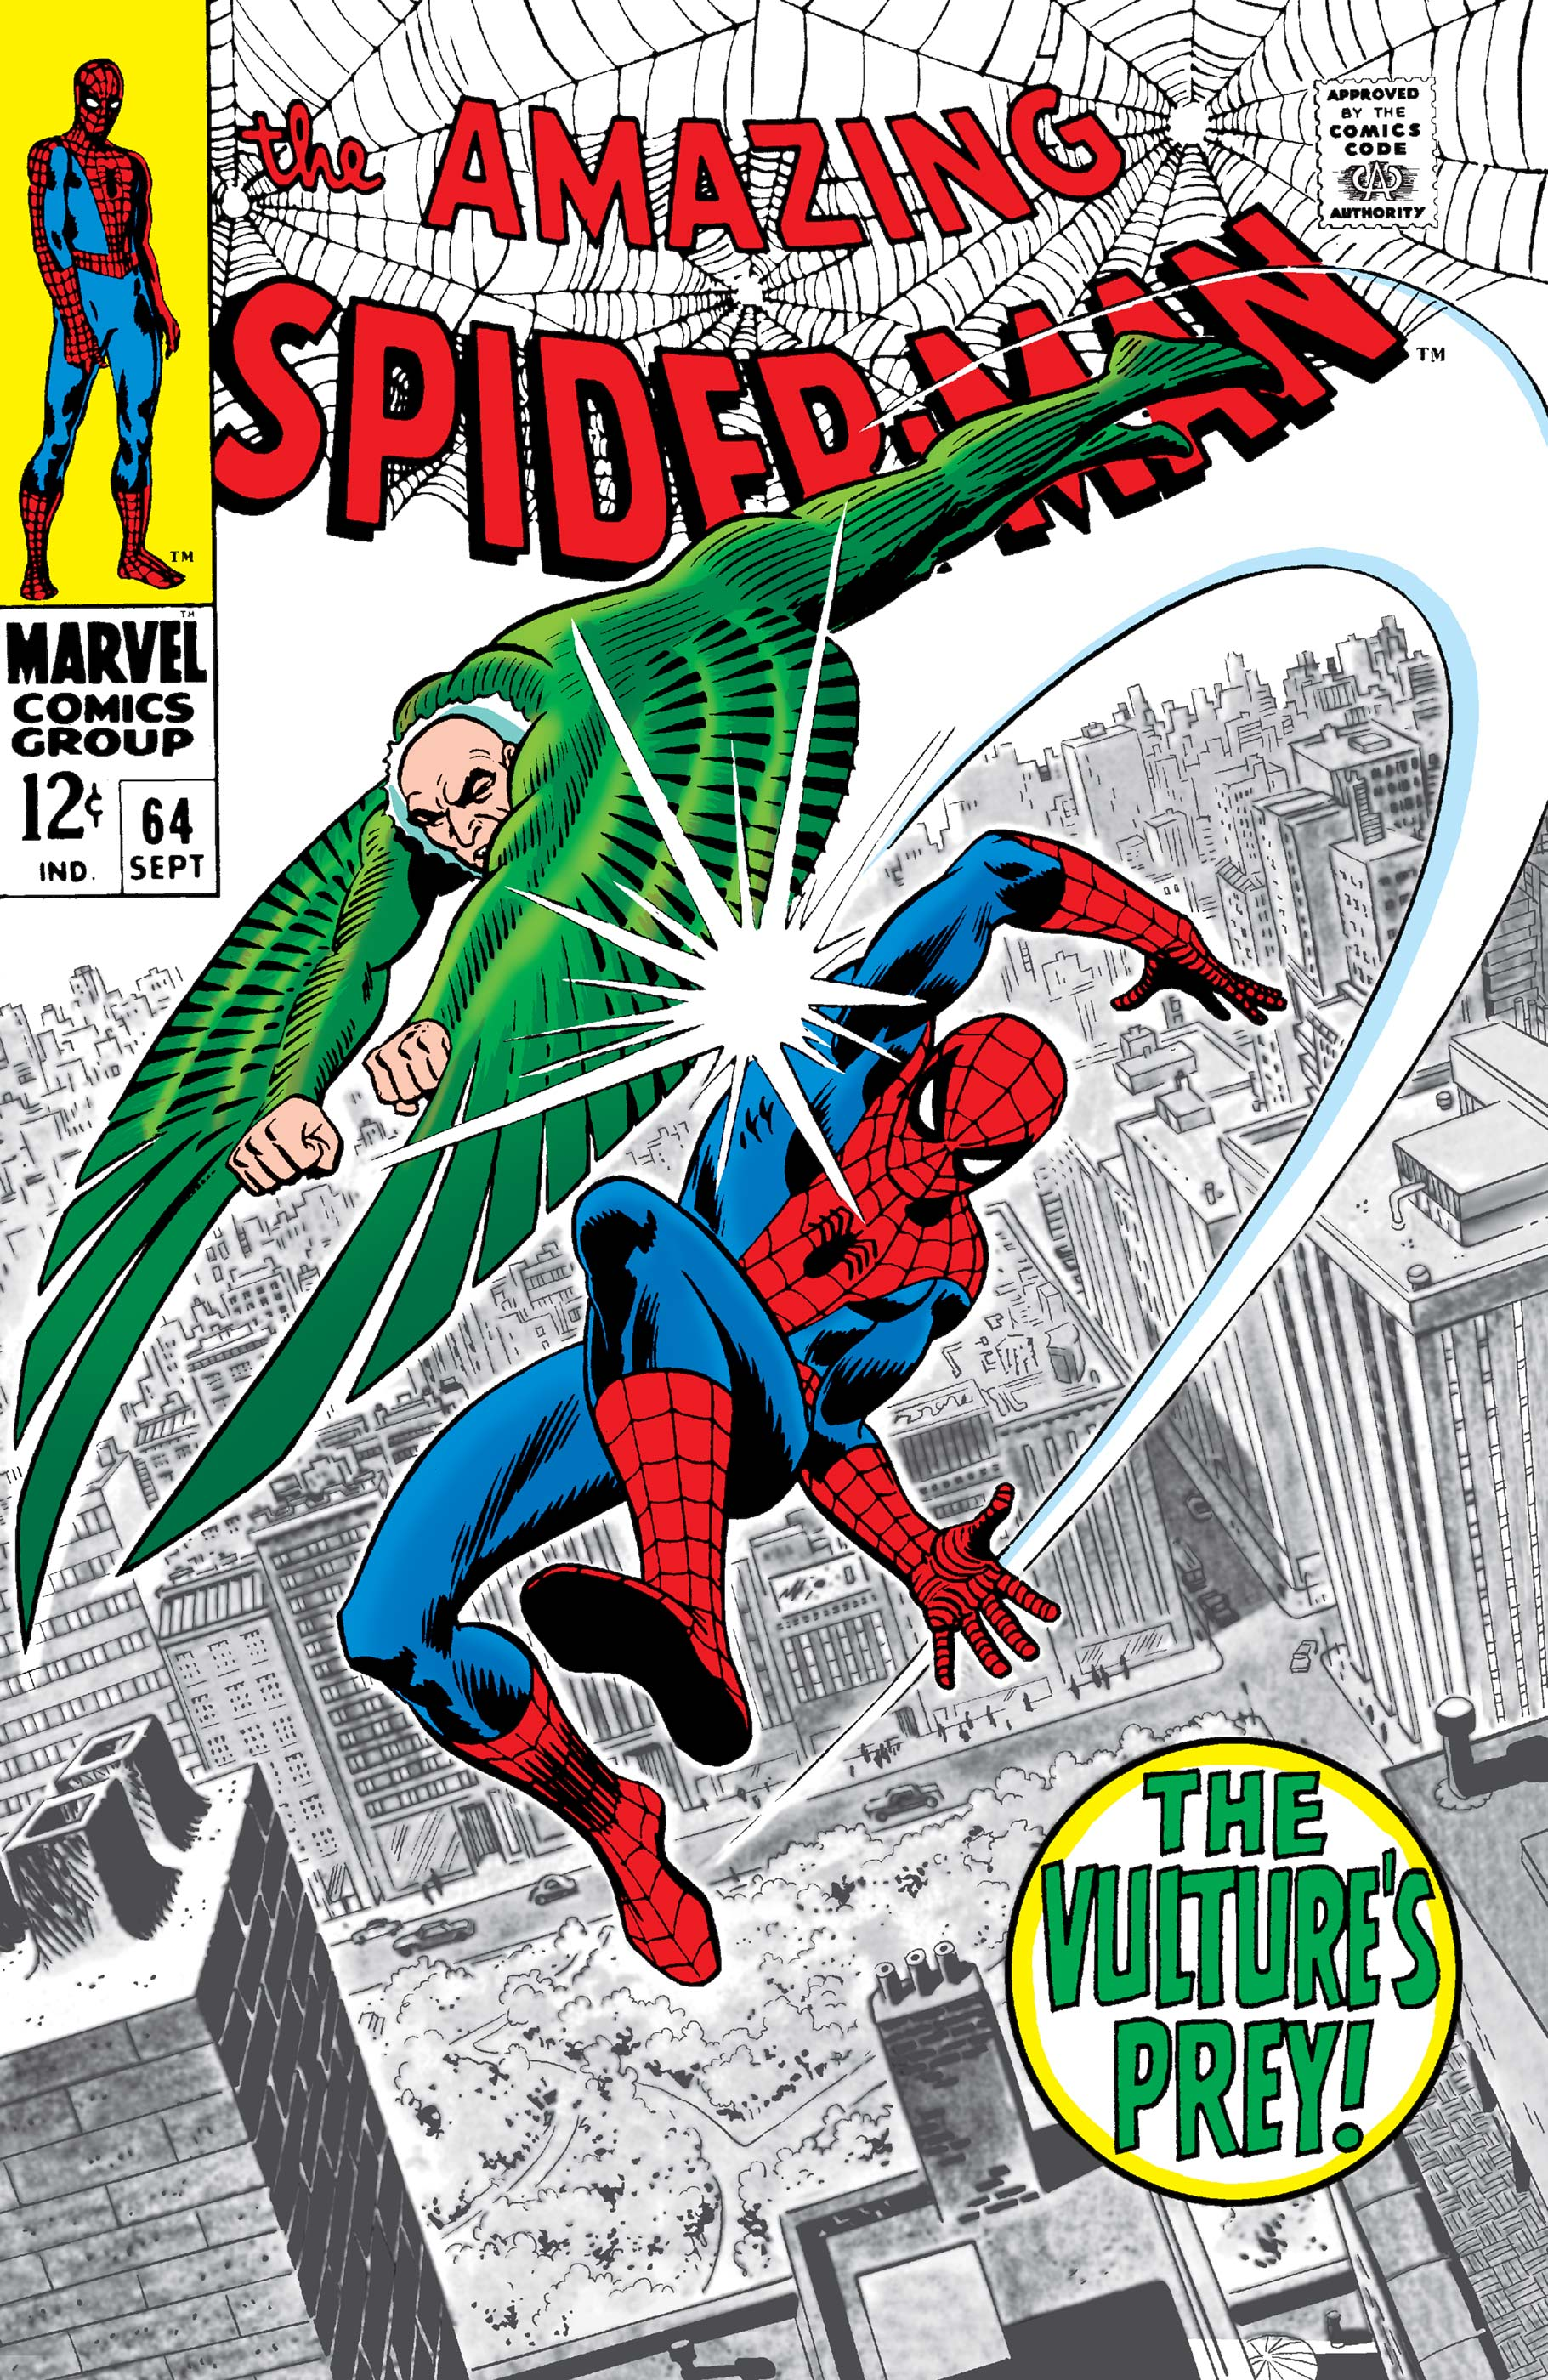 The Amazing Spider-Man (1963) #64